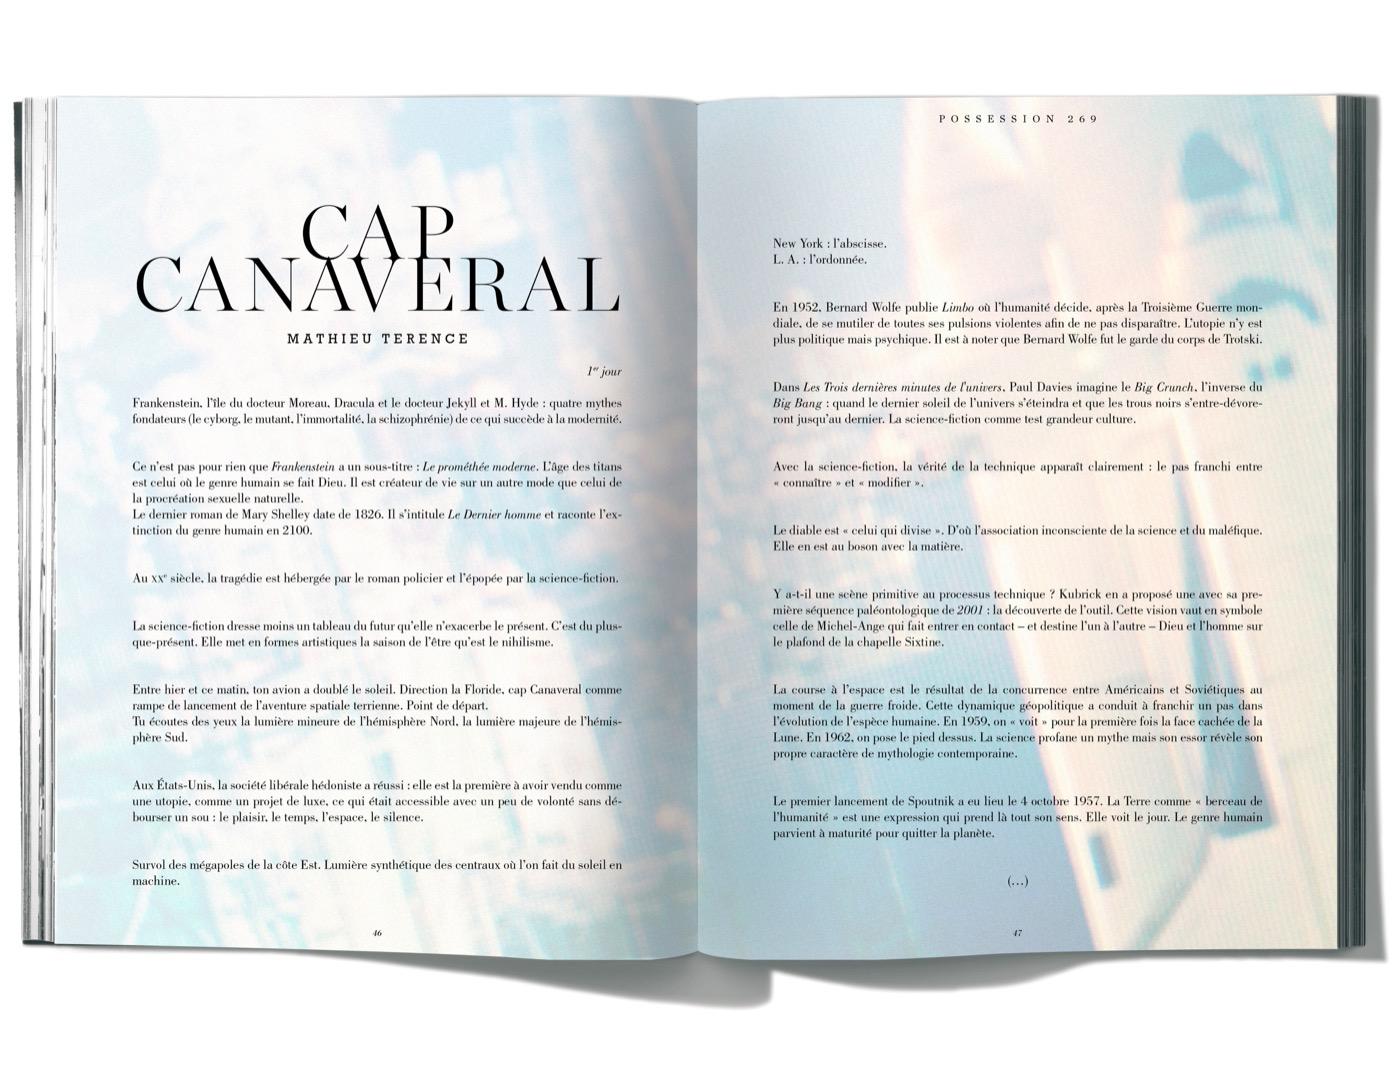 Texte de Mathieu Terence, Cap Canaveral